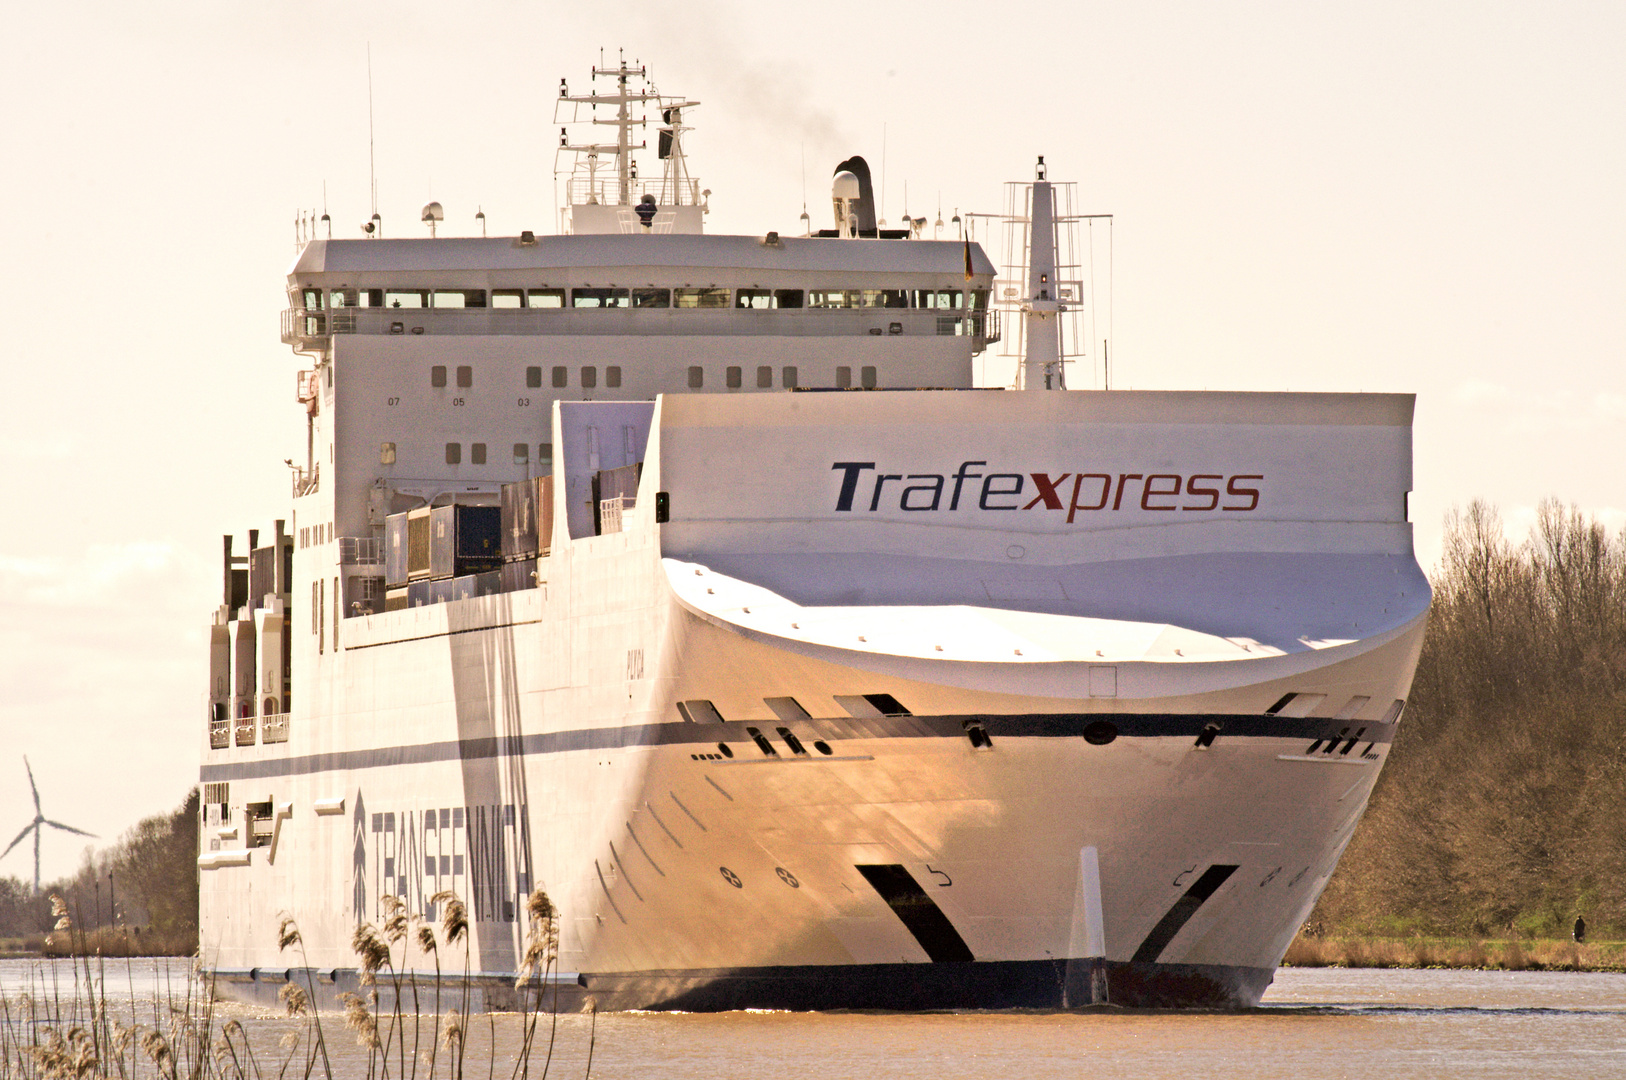 Nord-Ostsee- Kanal Ostern 2012 Trafexpress